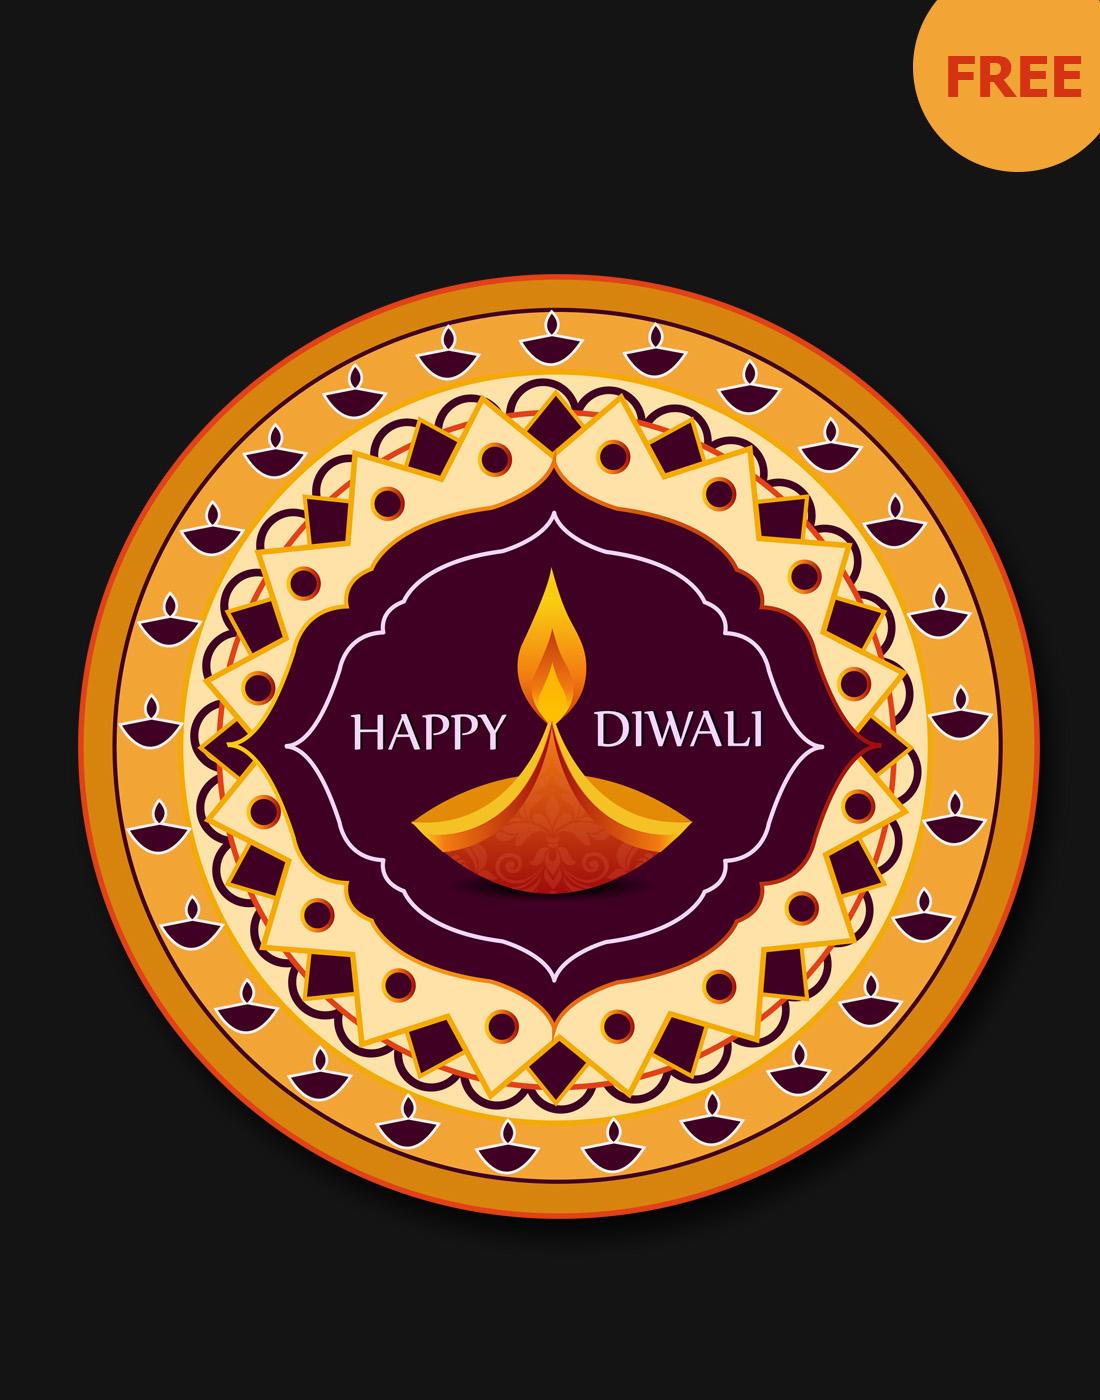 free diwali graphic